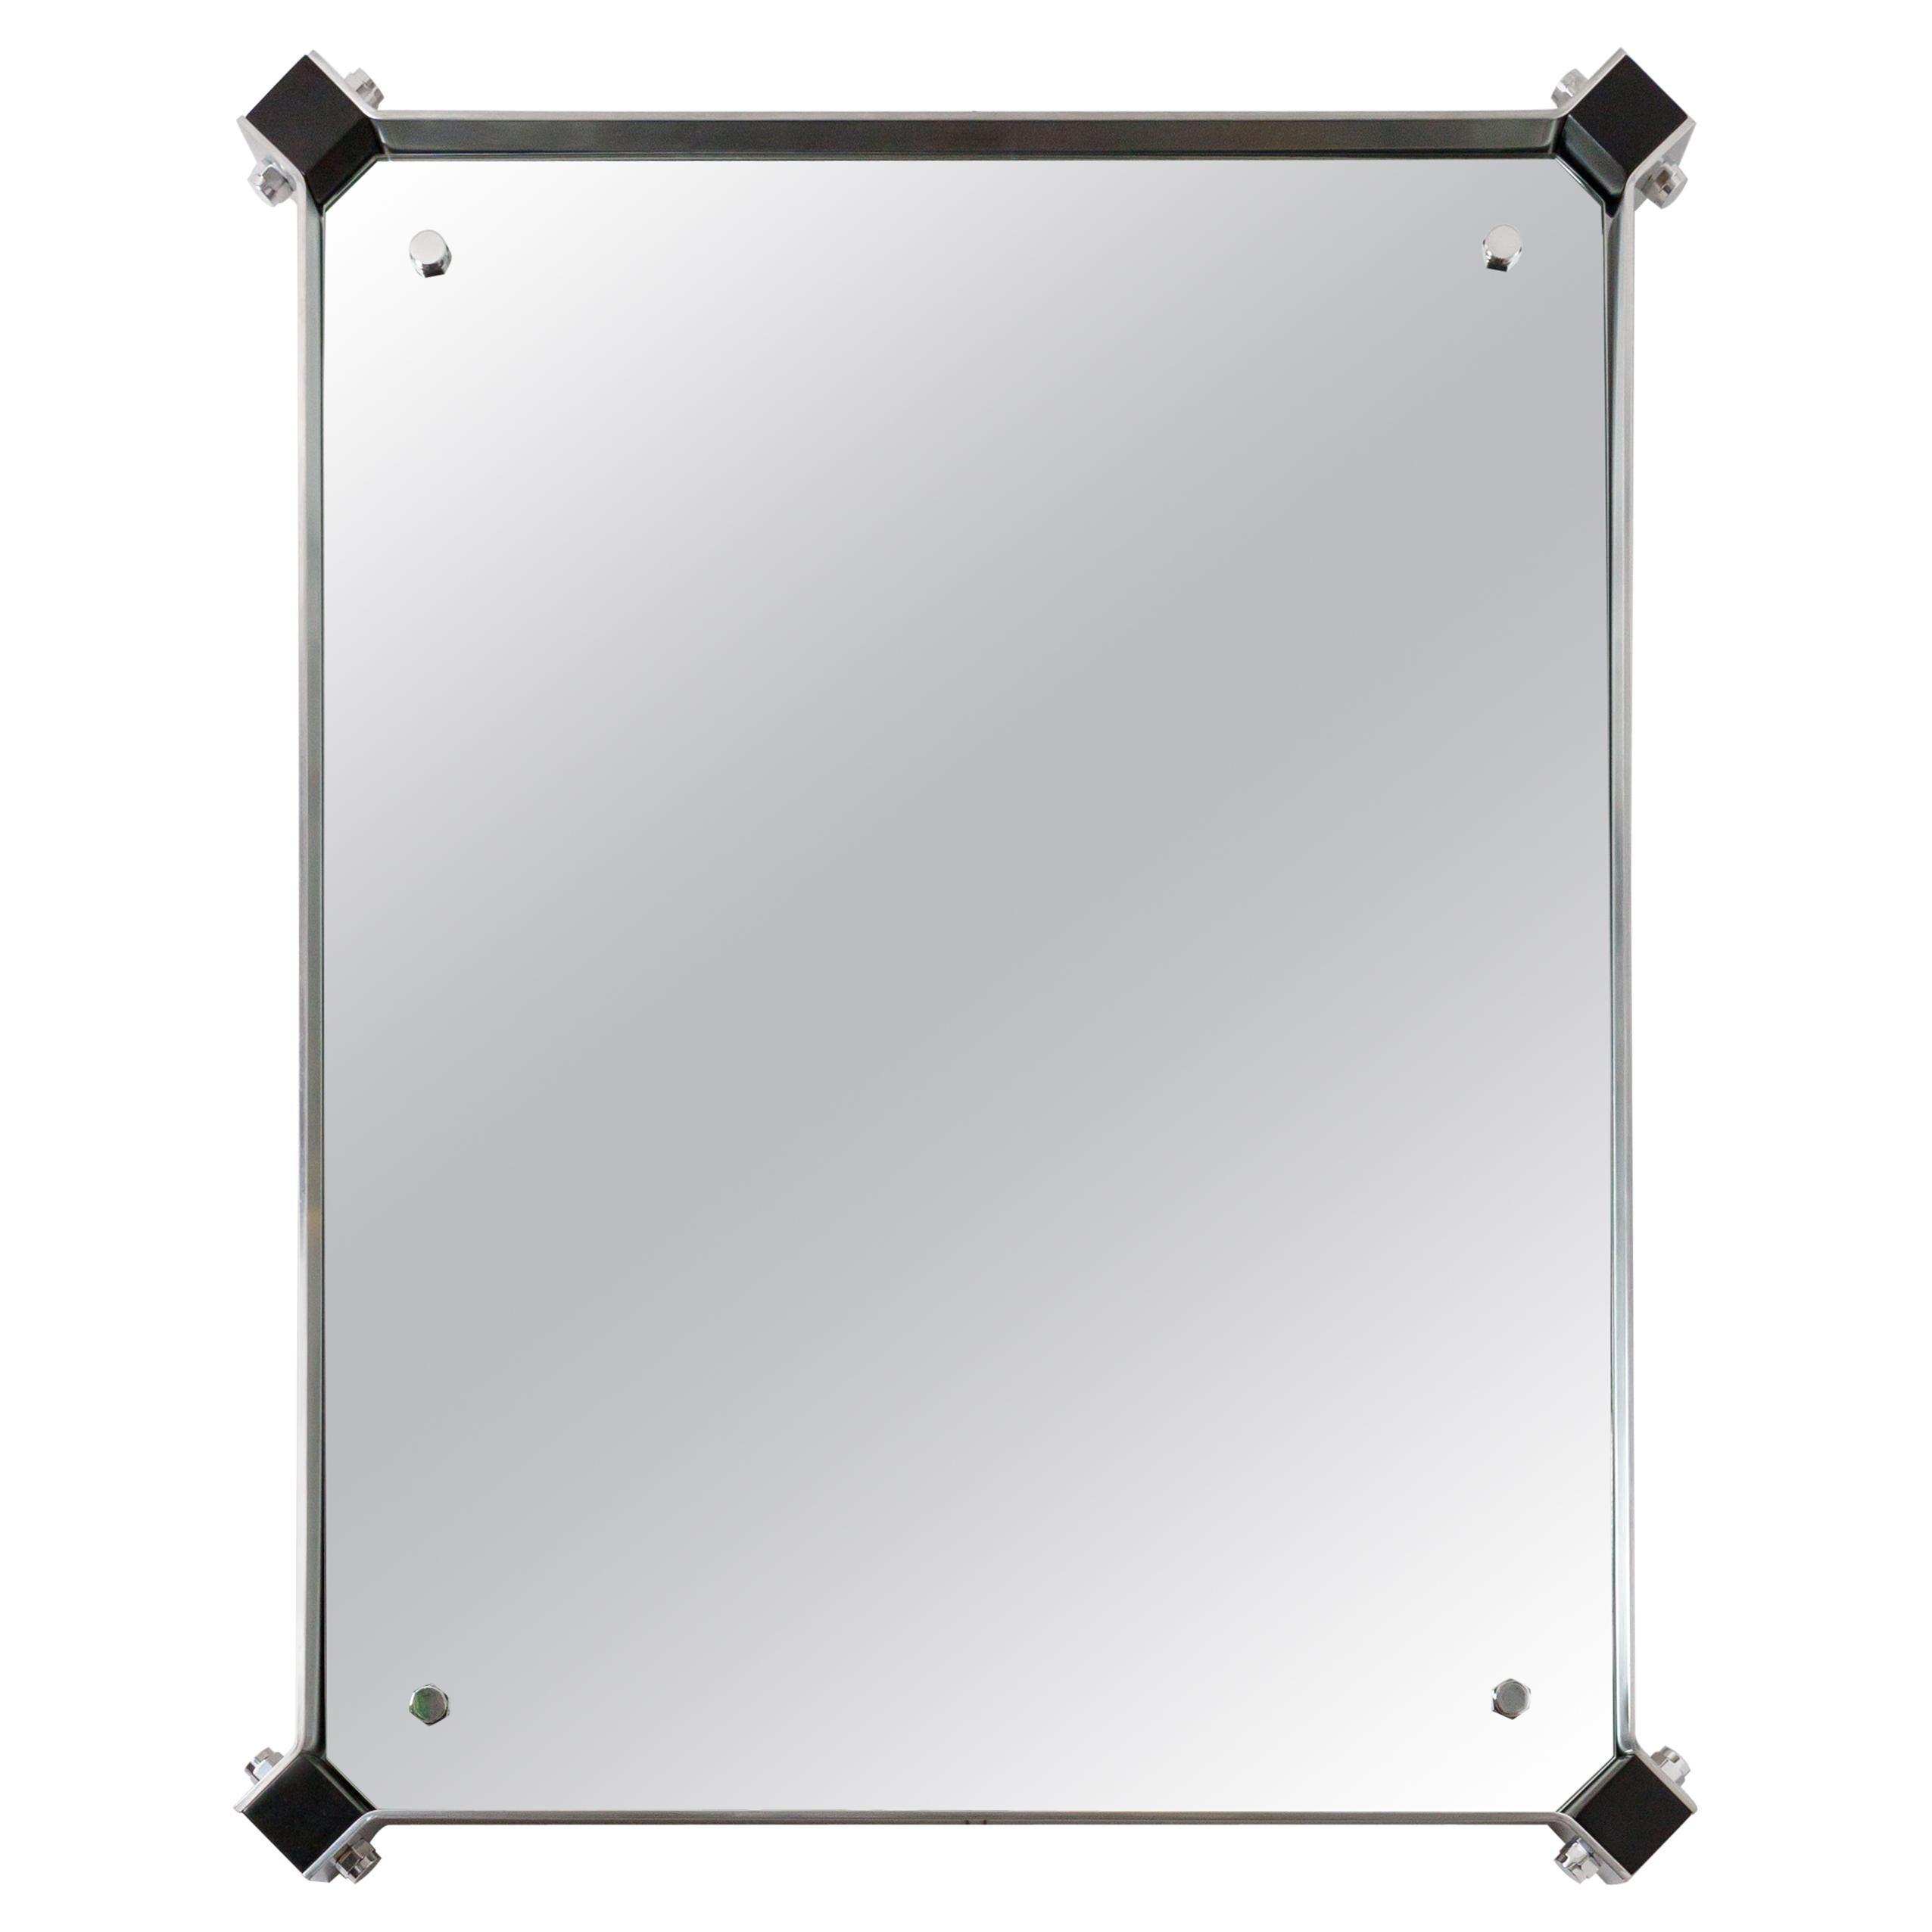 Rectangular Mirror with Stainless Steel Surround with Black Corner Details